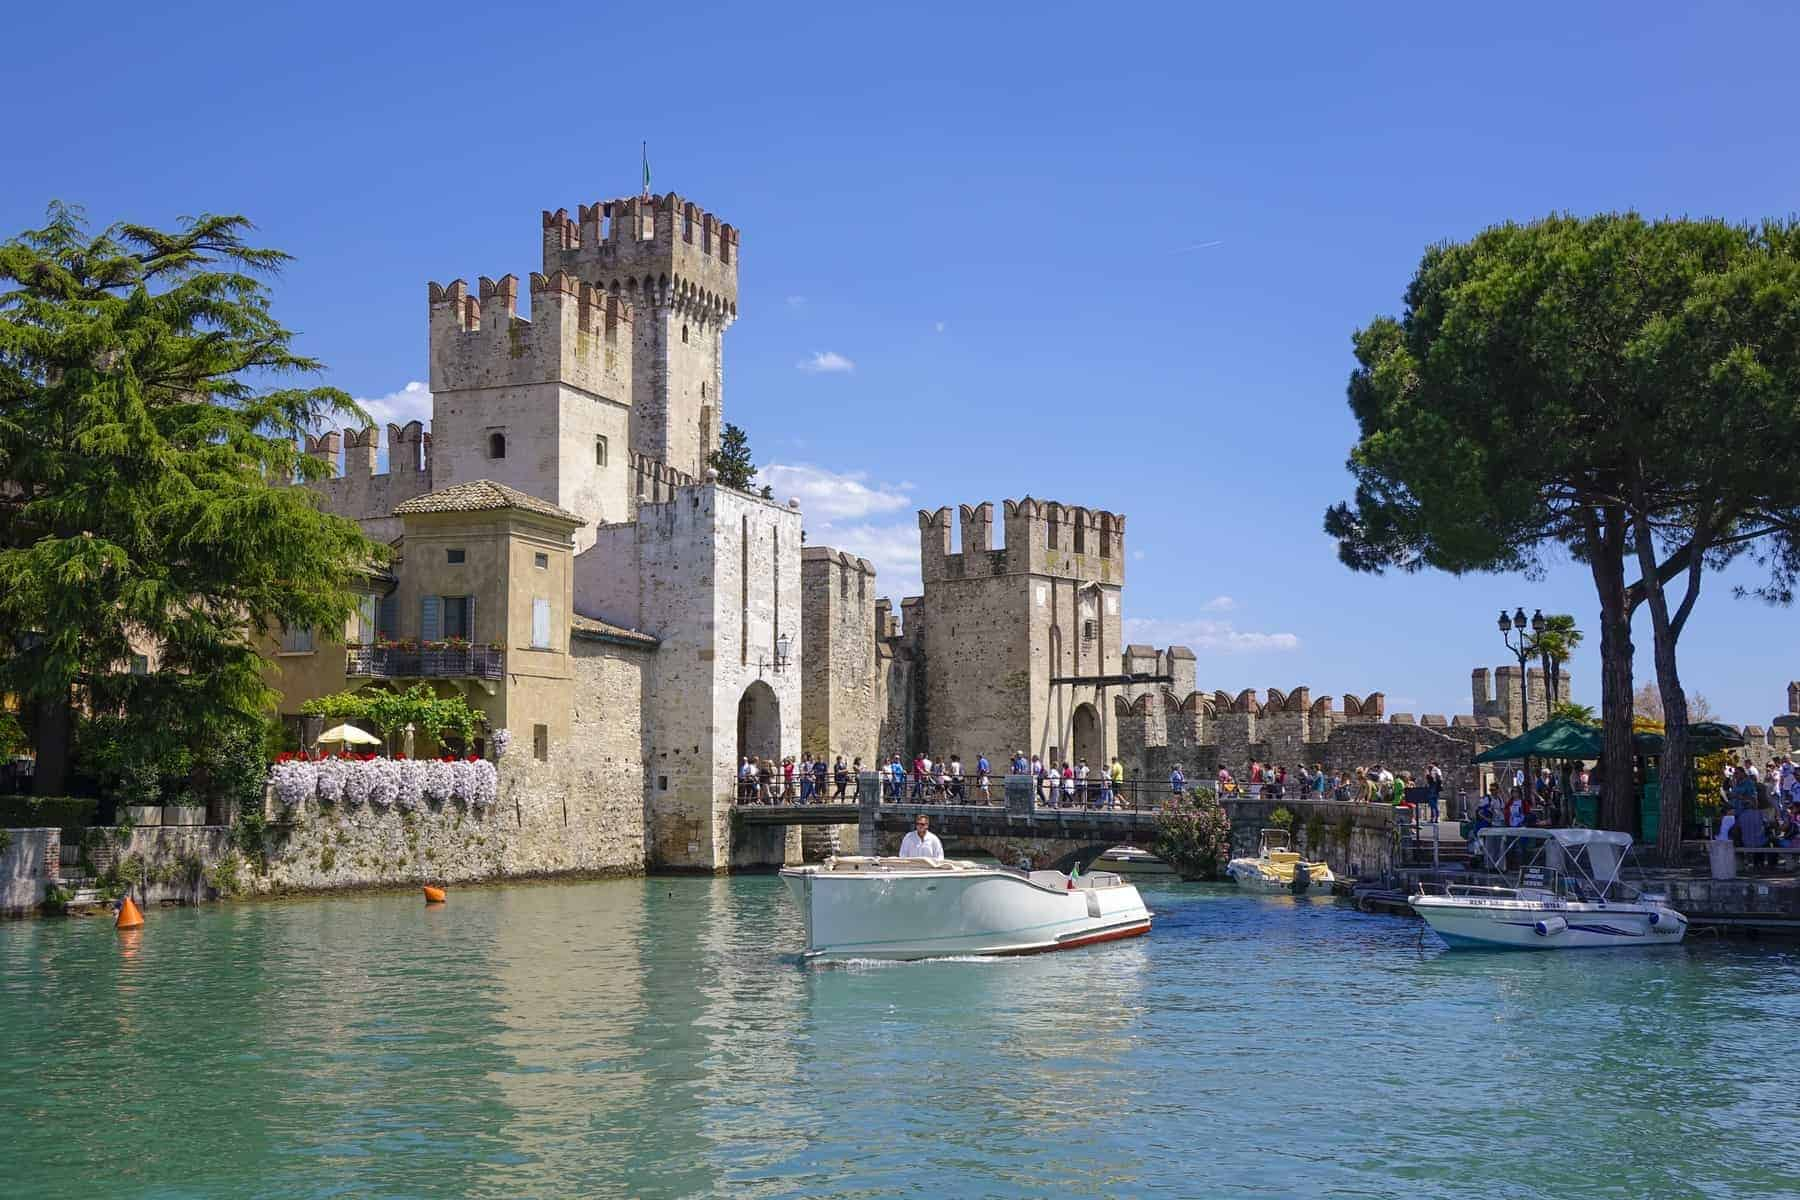 Castello Scaligero in Sirmione on Lake Garda, Lombardy, Italy, Europe